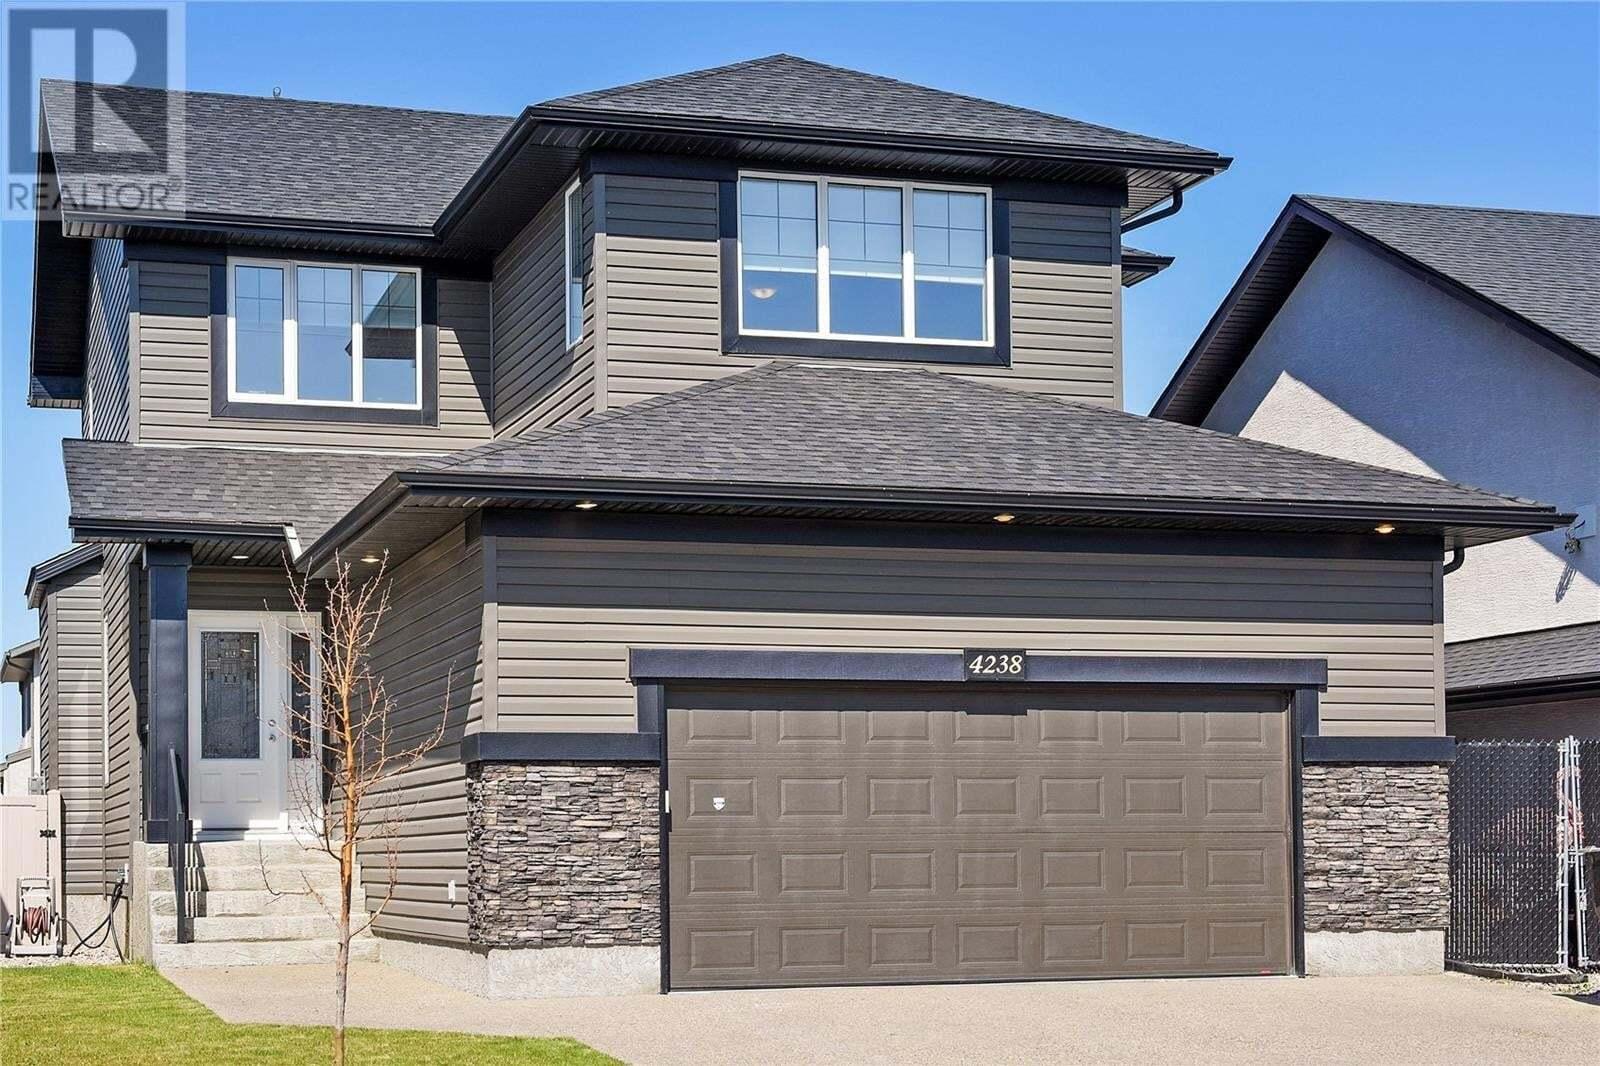 House for sale at 4238 Skinner Ct Regina Saskatchewan - MLS: SK808777